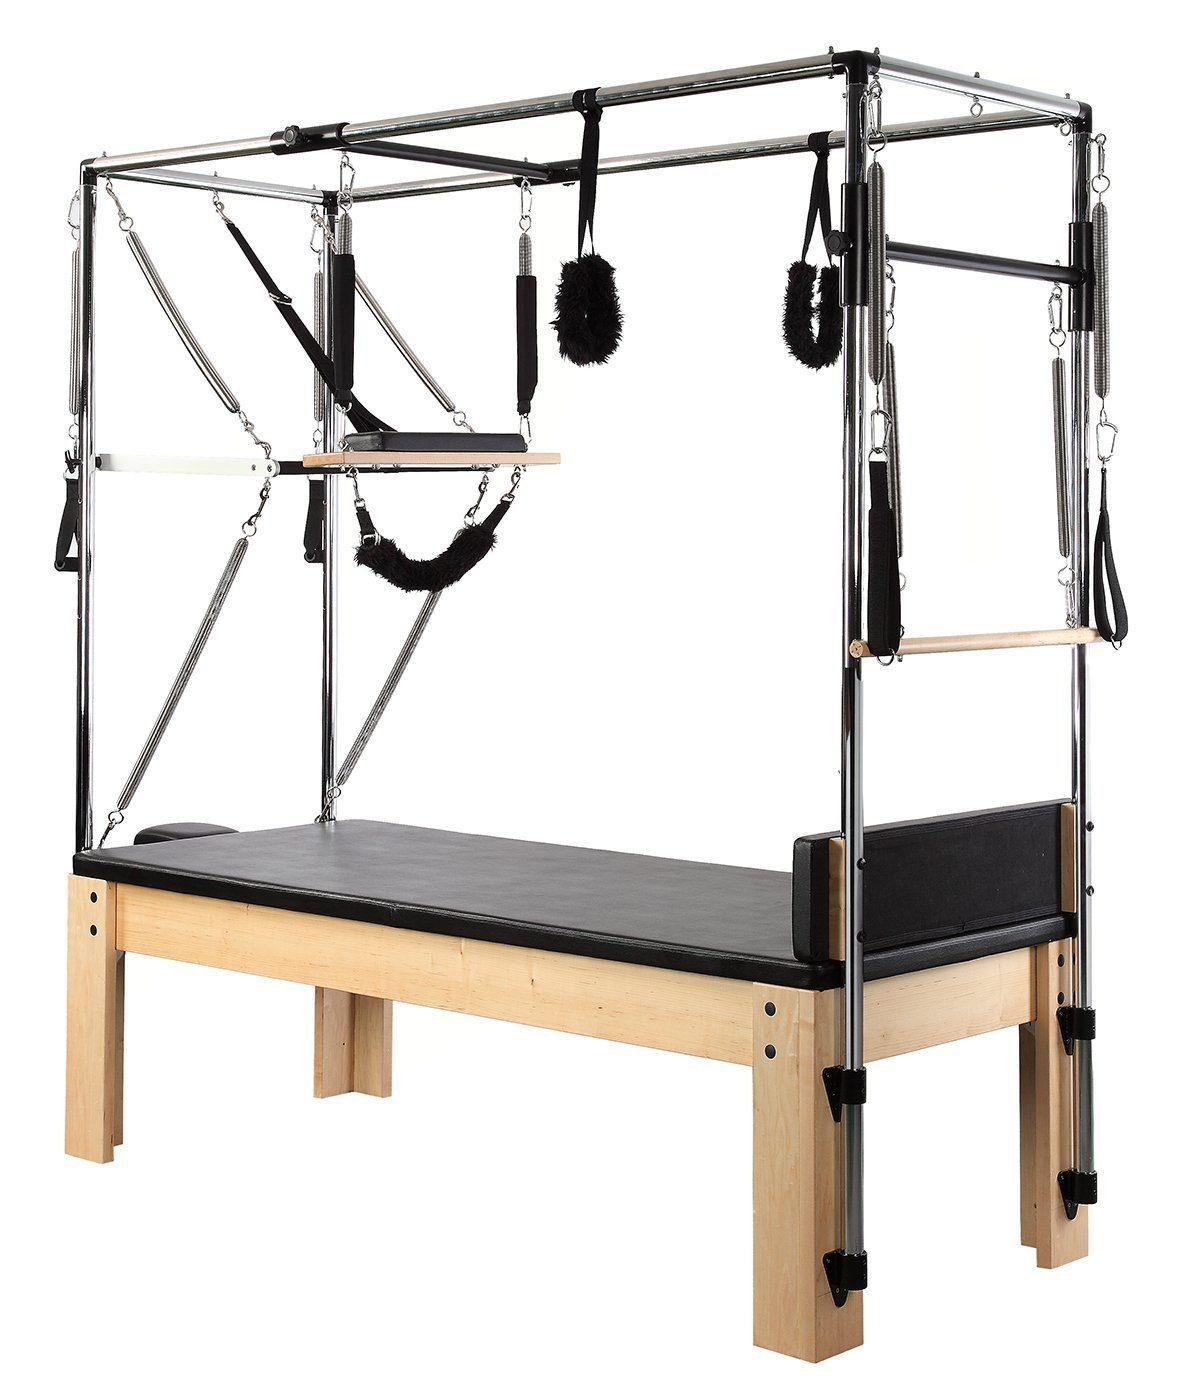 reformer-cadillac-pilates-yogistar